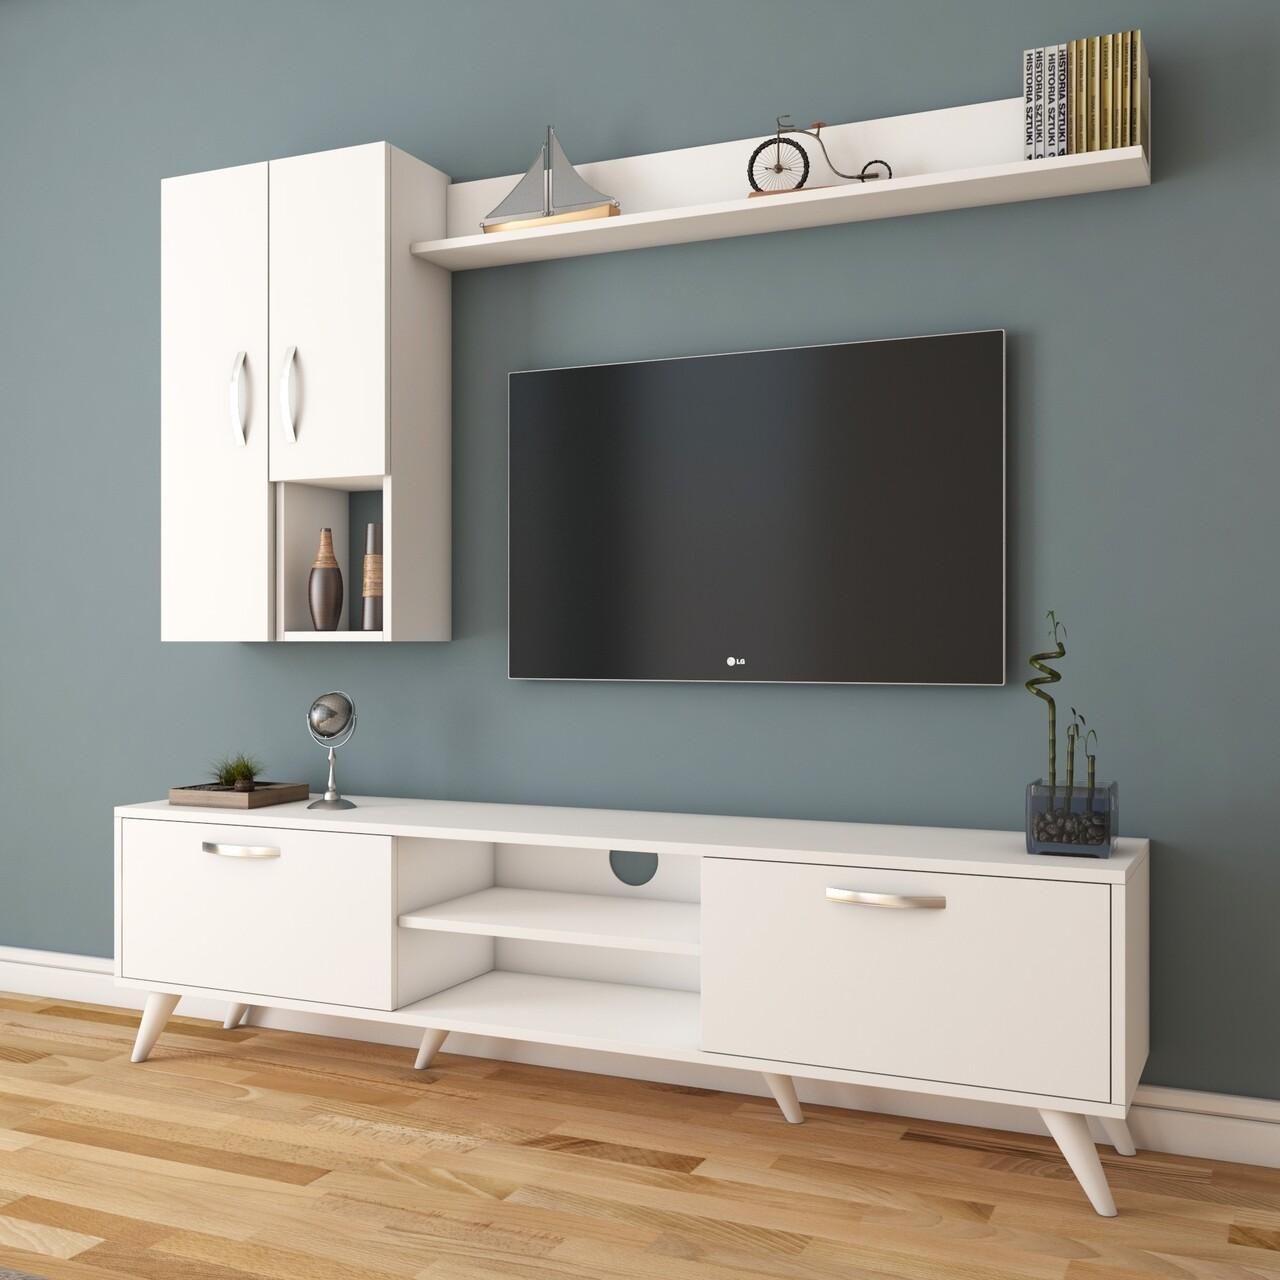 Comoda TV cu raft de perete si 2 cabinete M34 - 295, Wren, 180 x 35 x 48.6 cm/90 cm/133 cm, white